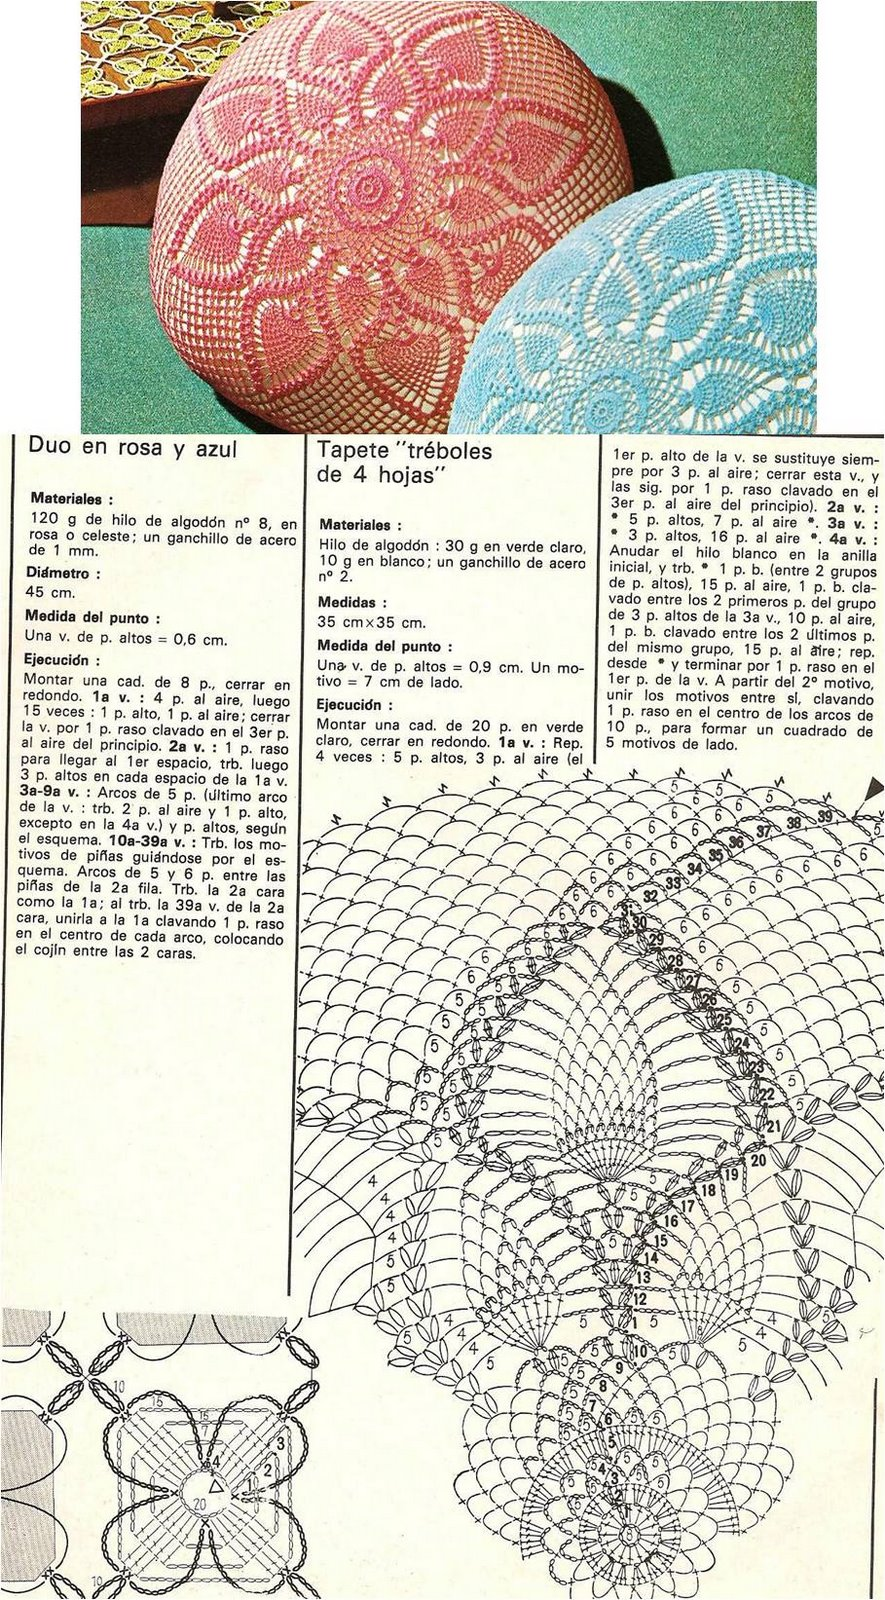 Excelente Grandes Patrones De Crochet Tapete Componente - Ideas de ...